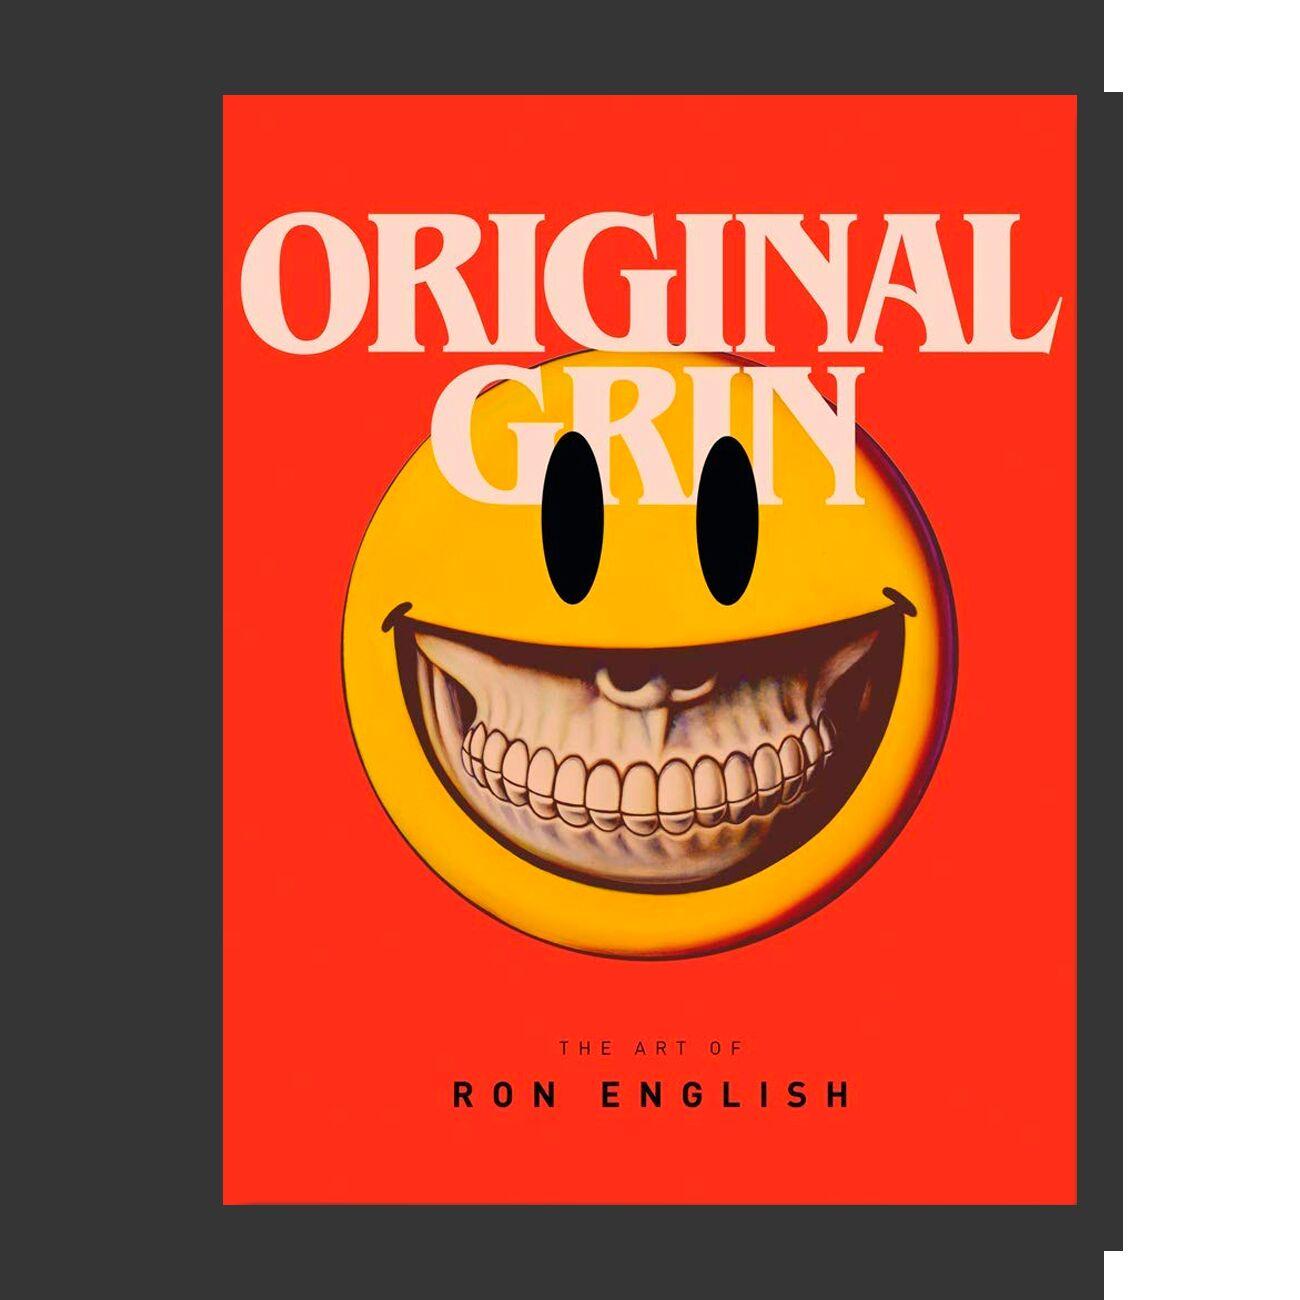 Original Grin: The Art of Ron English